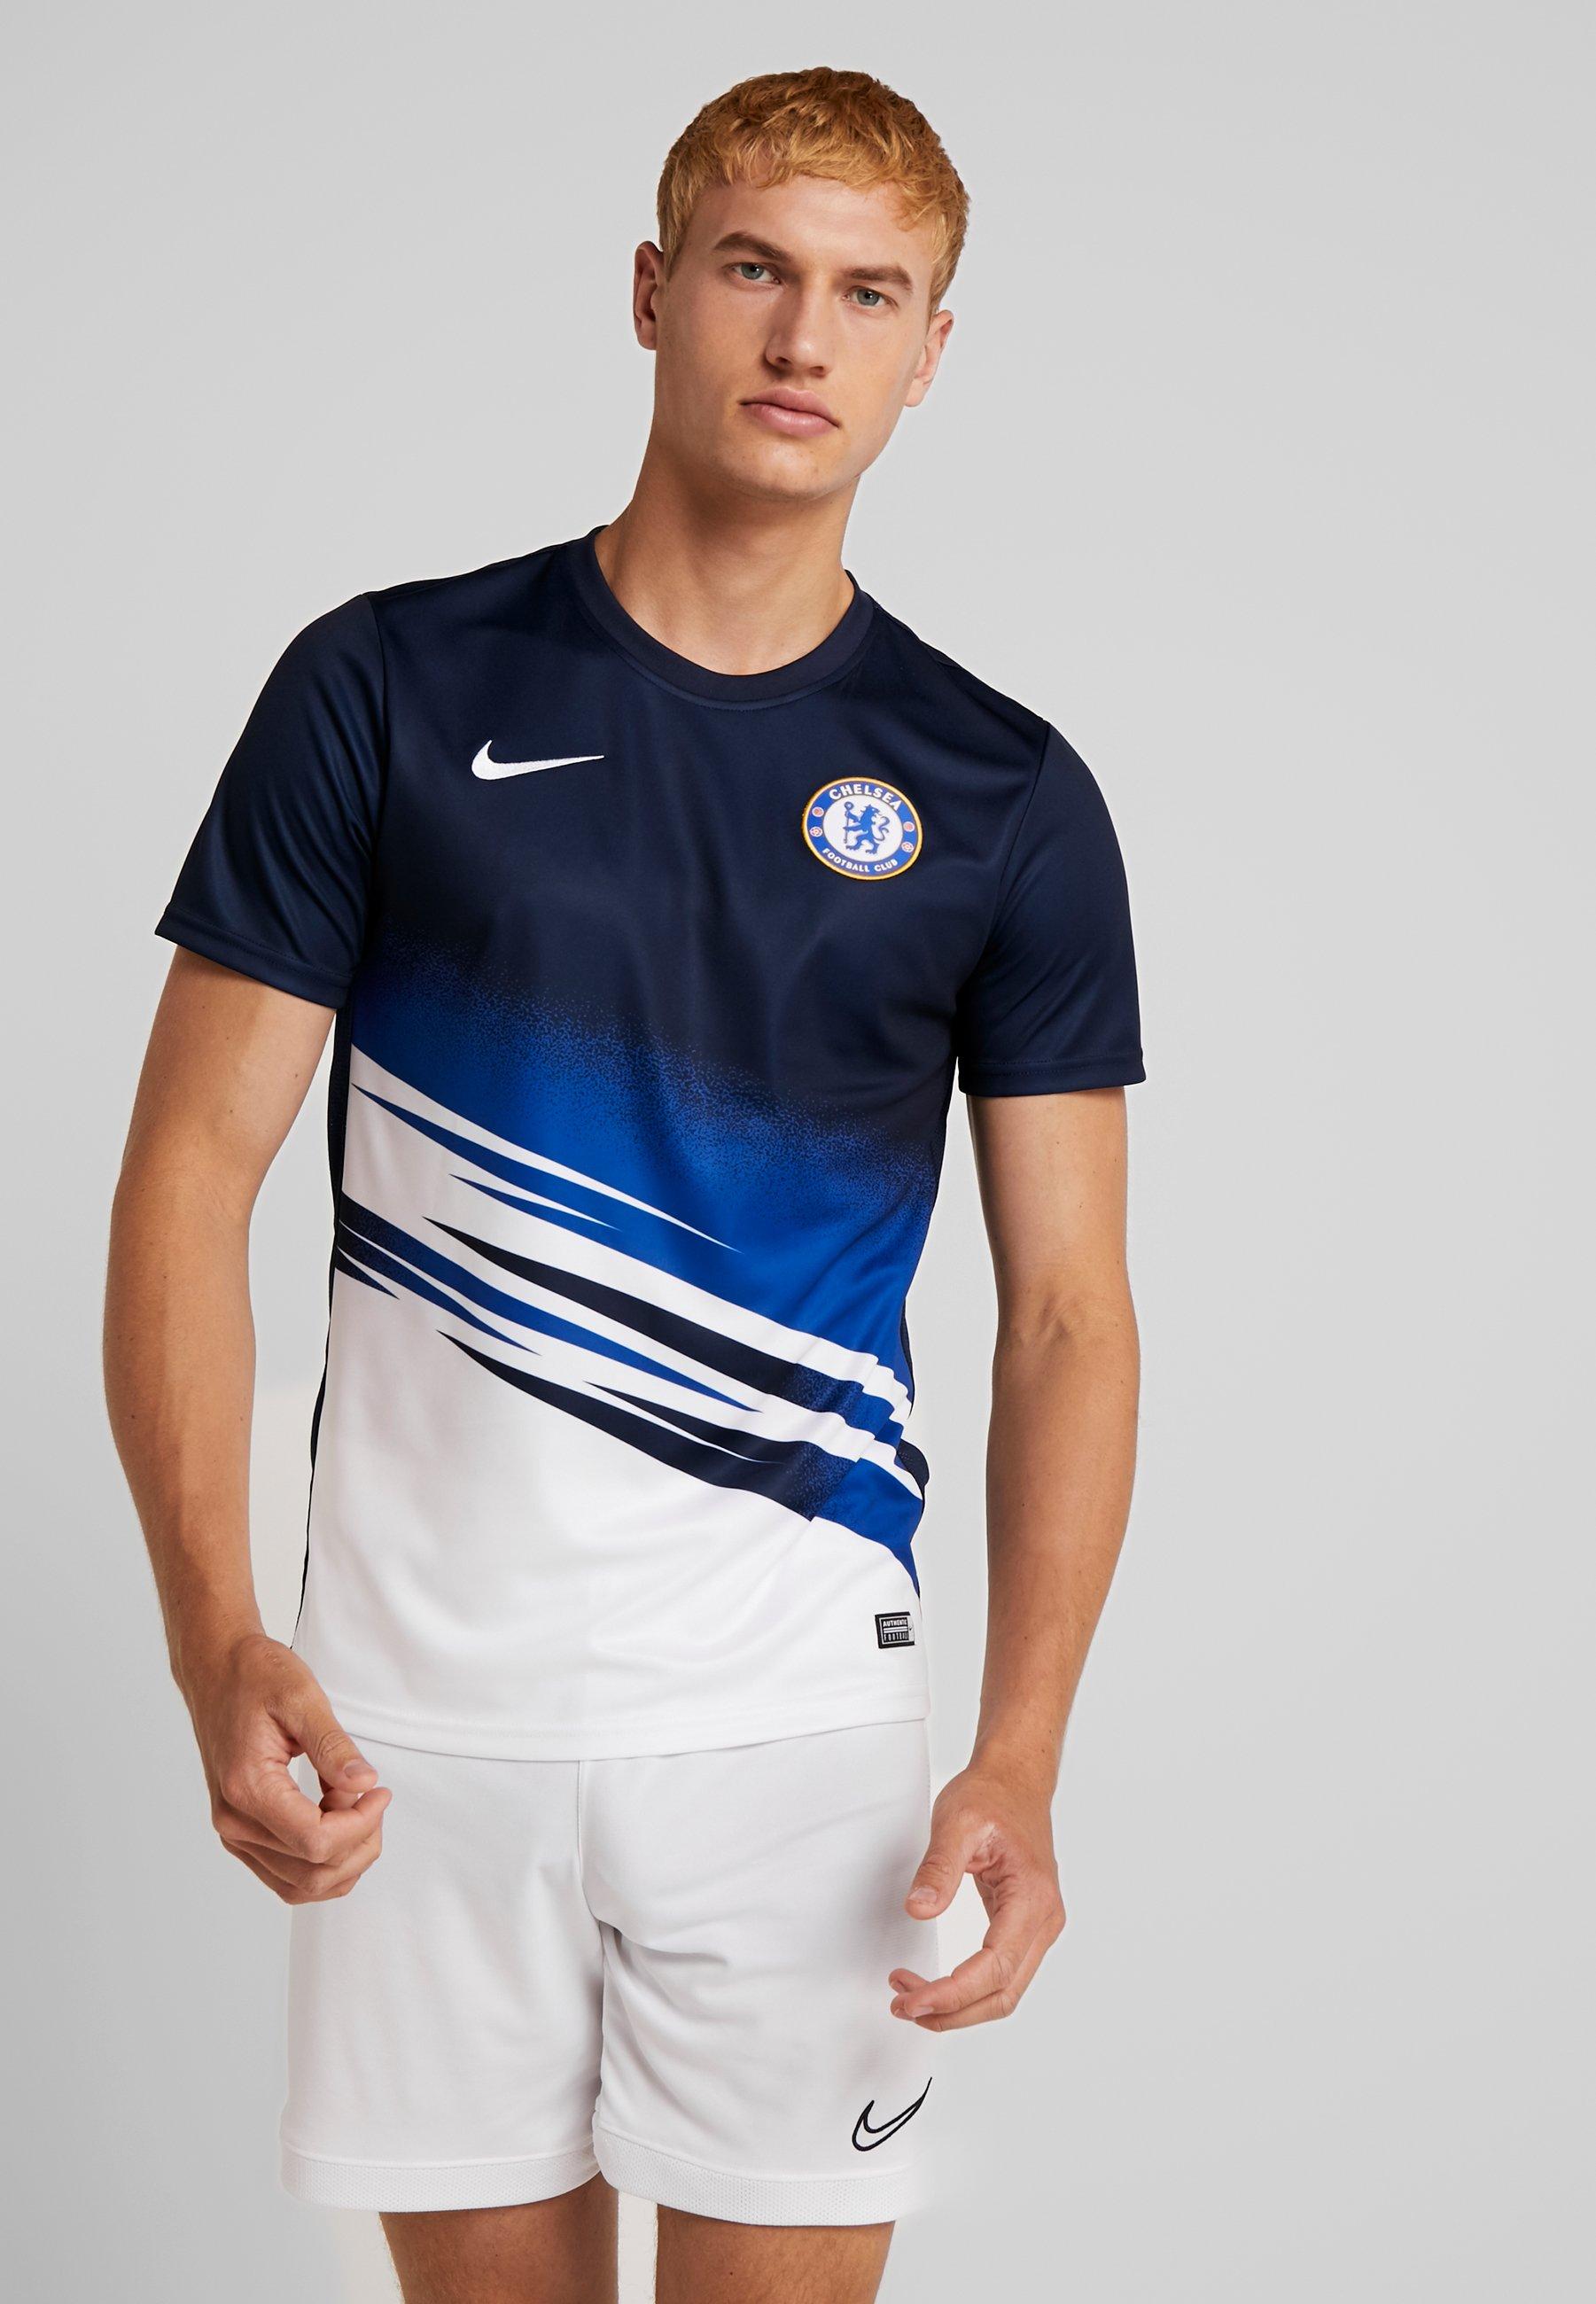 Nike Performance DRY T shirt de sport whiteobsidian